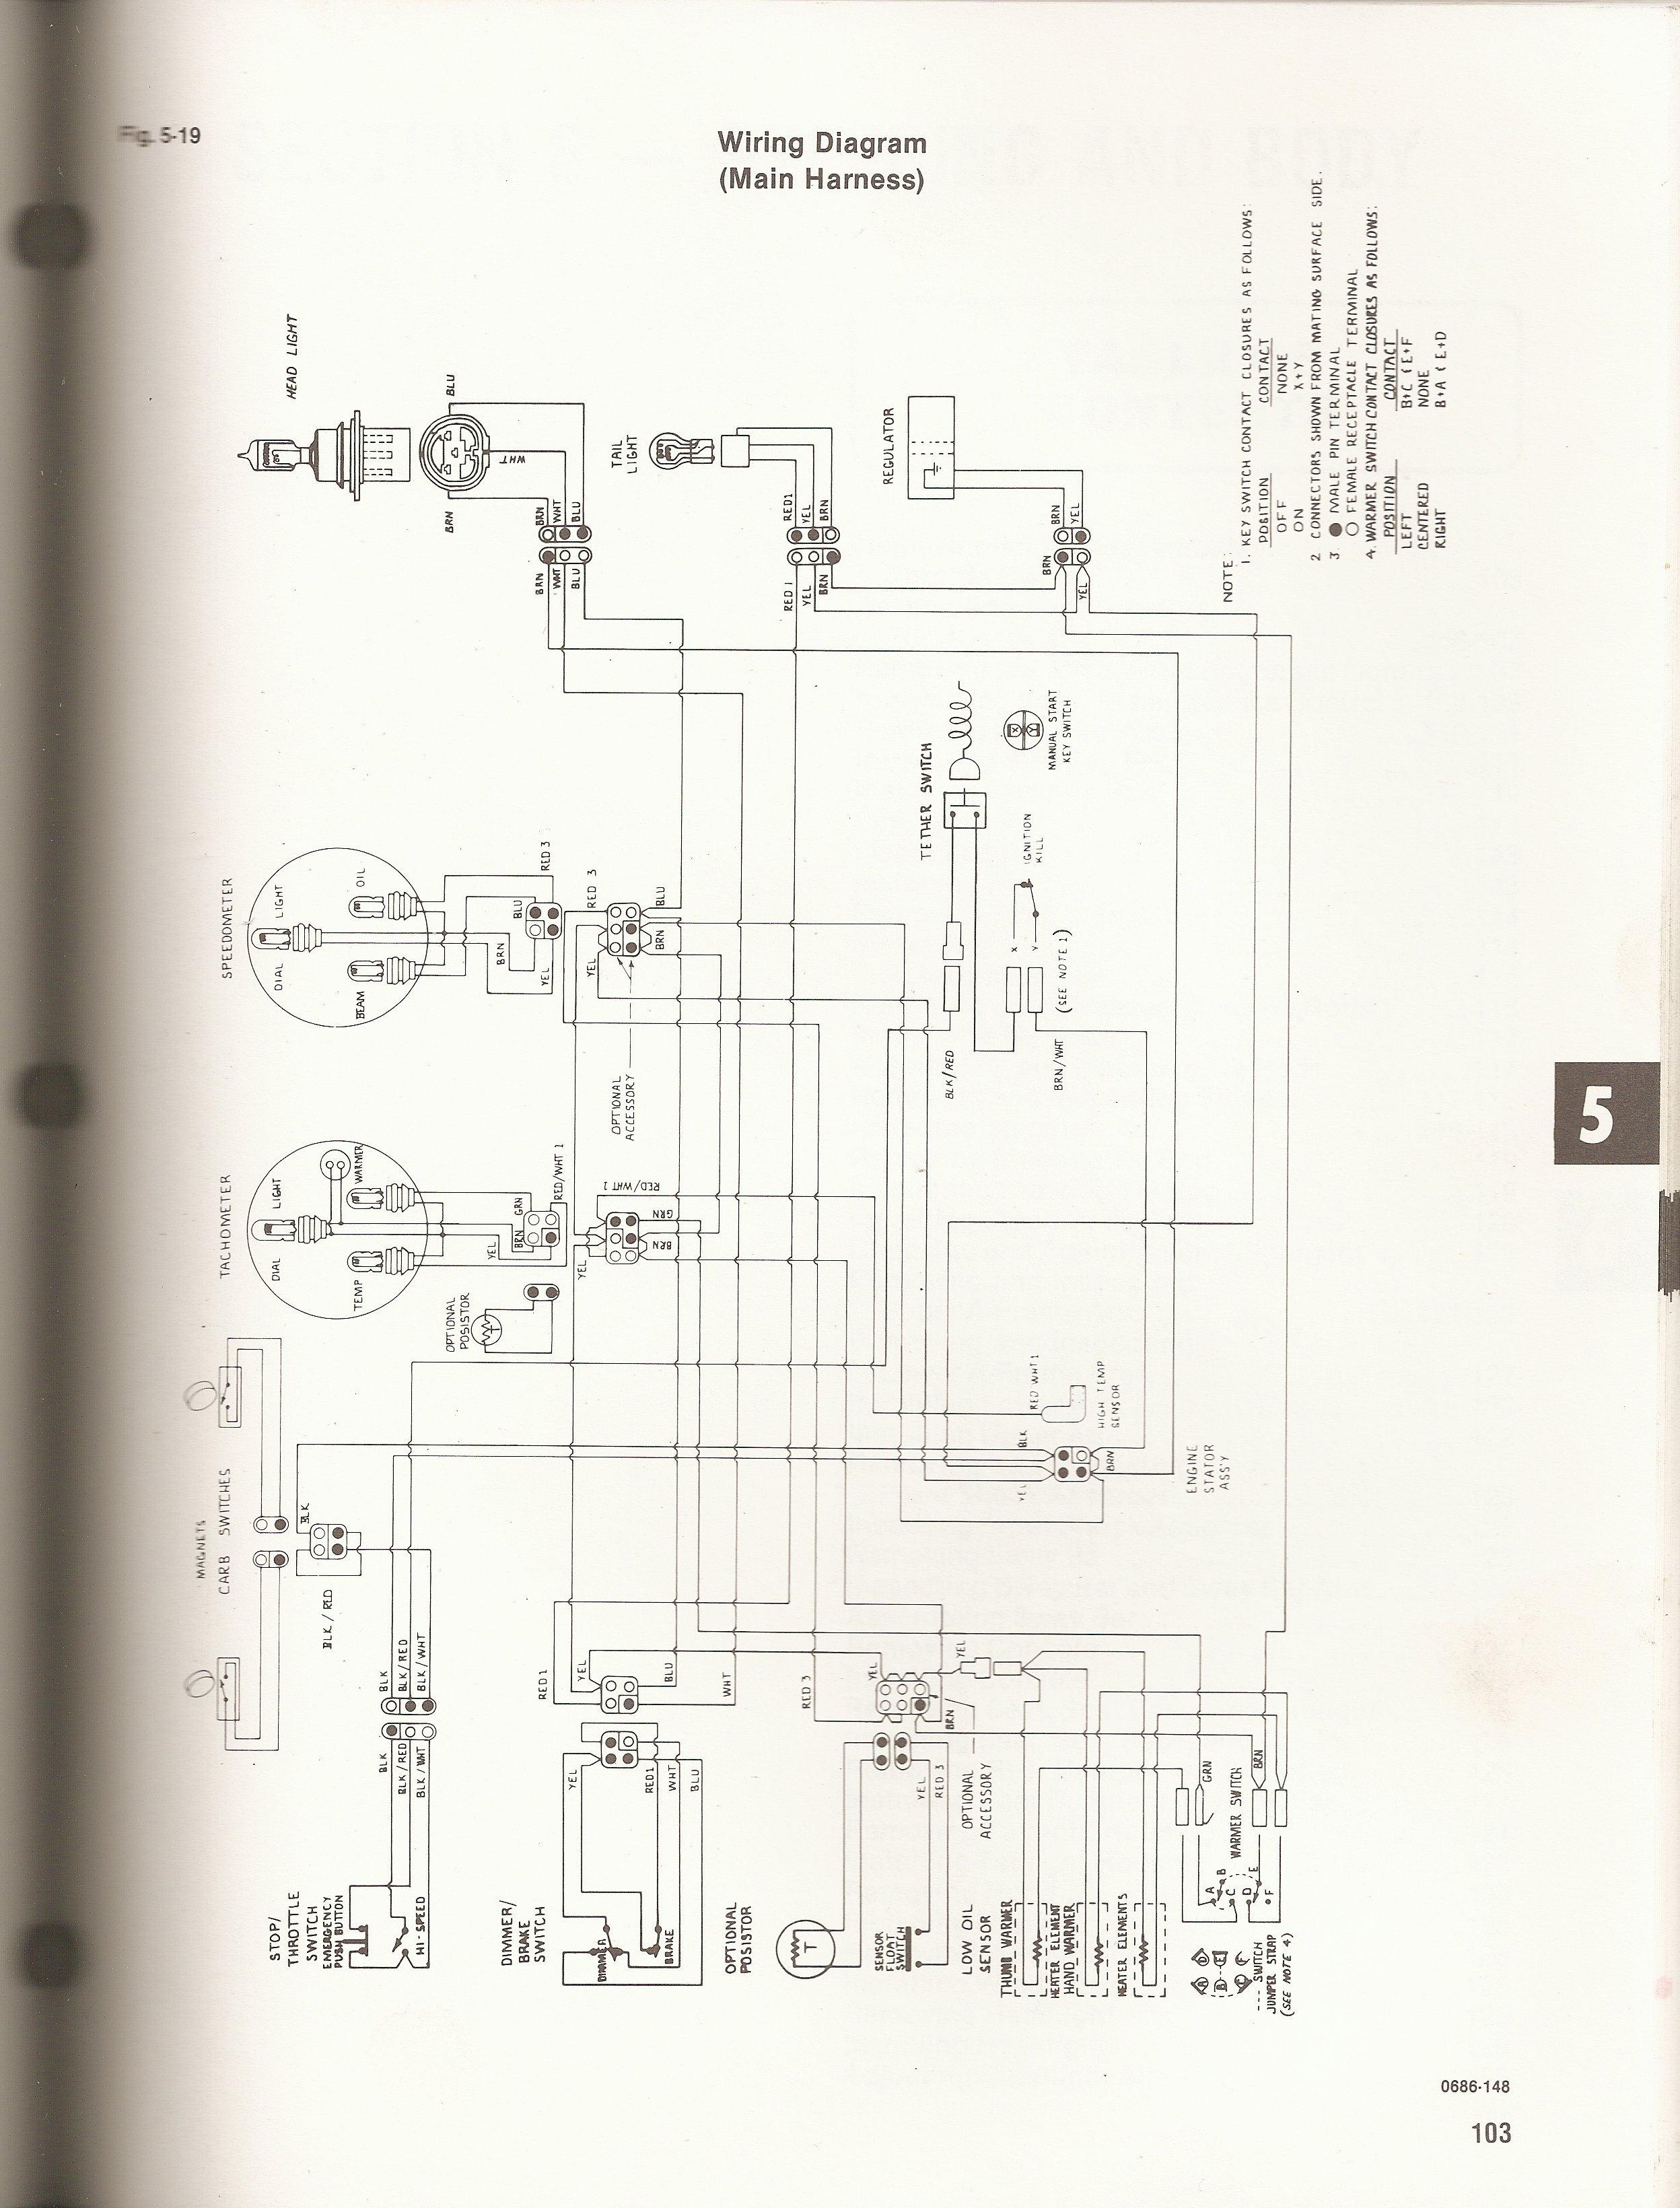 Polari Ez Go Wiring Harnes Diagram - Wiring Diagram